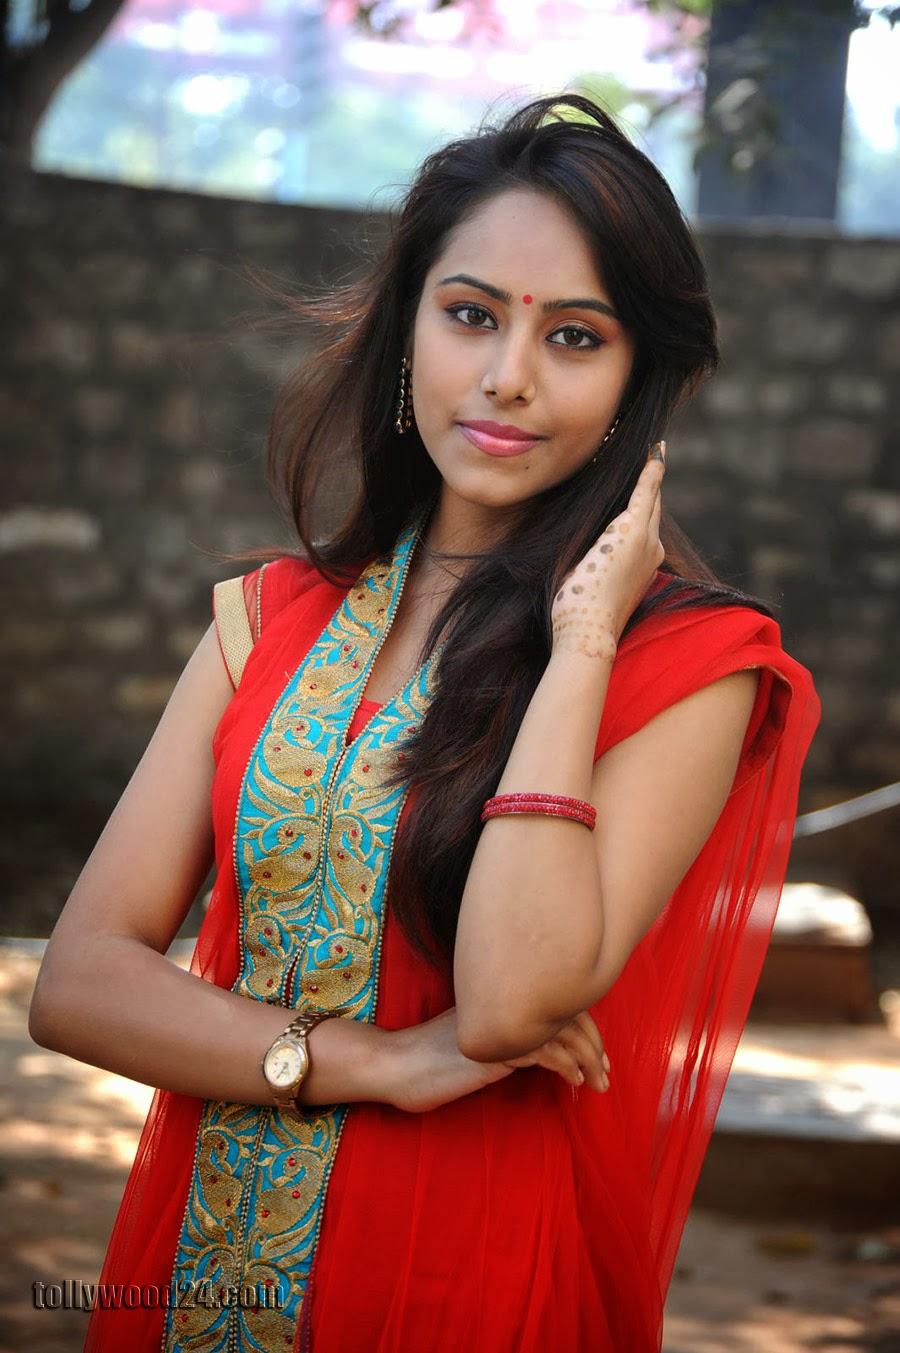 Beautiful Khenisha Chandran Photos Gallery-HQ-Photo-8